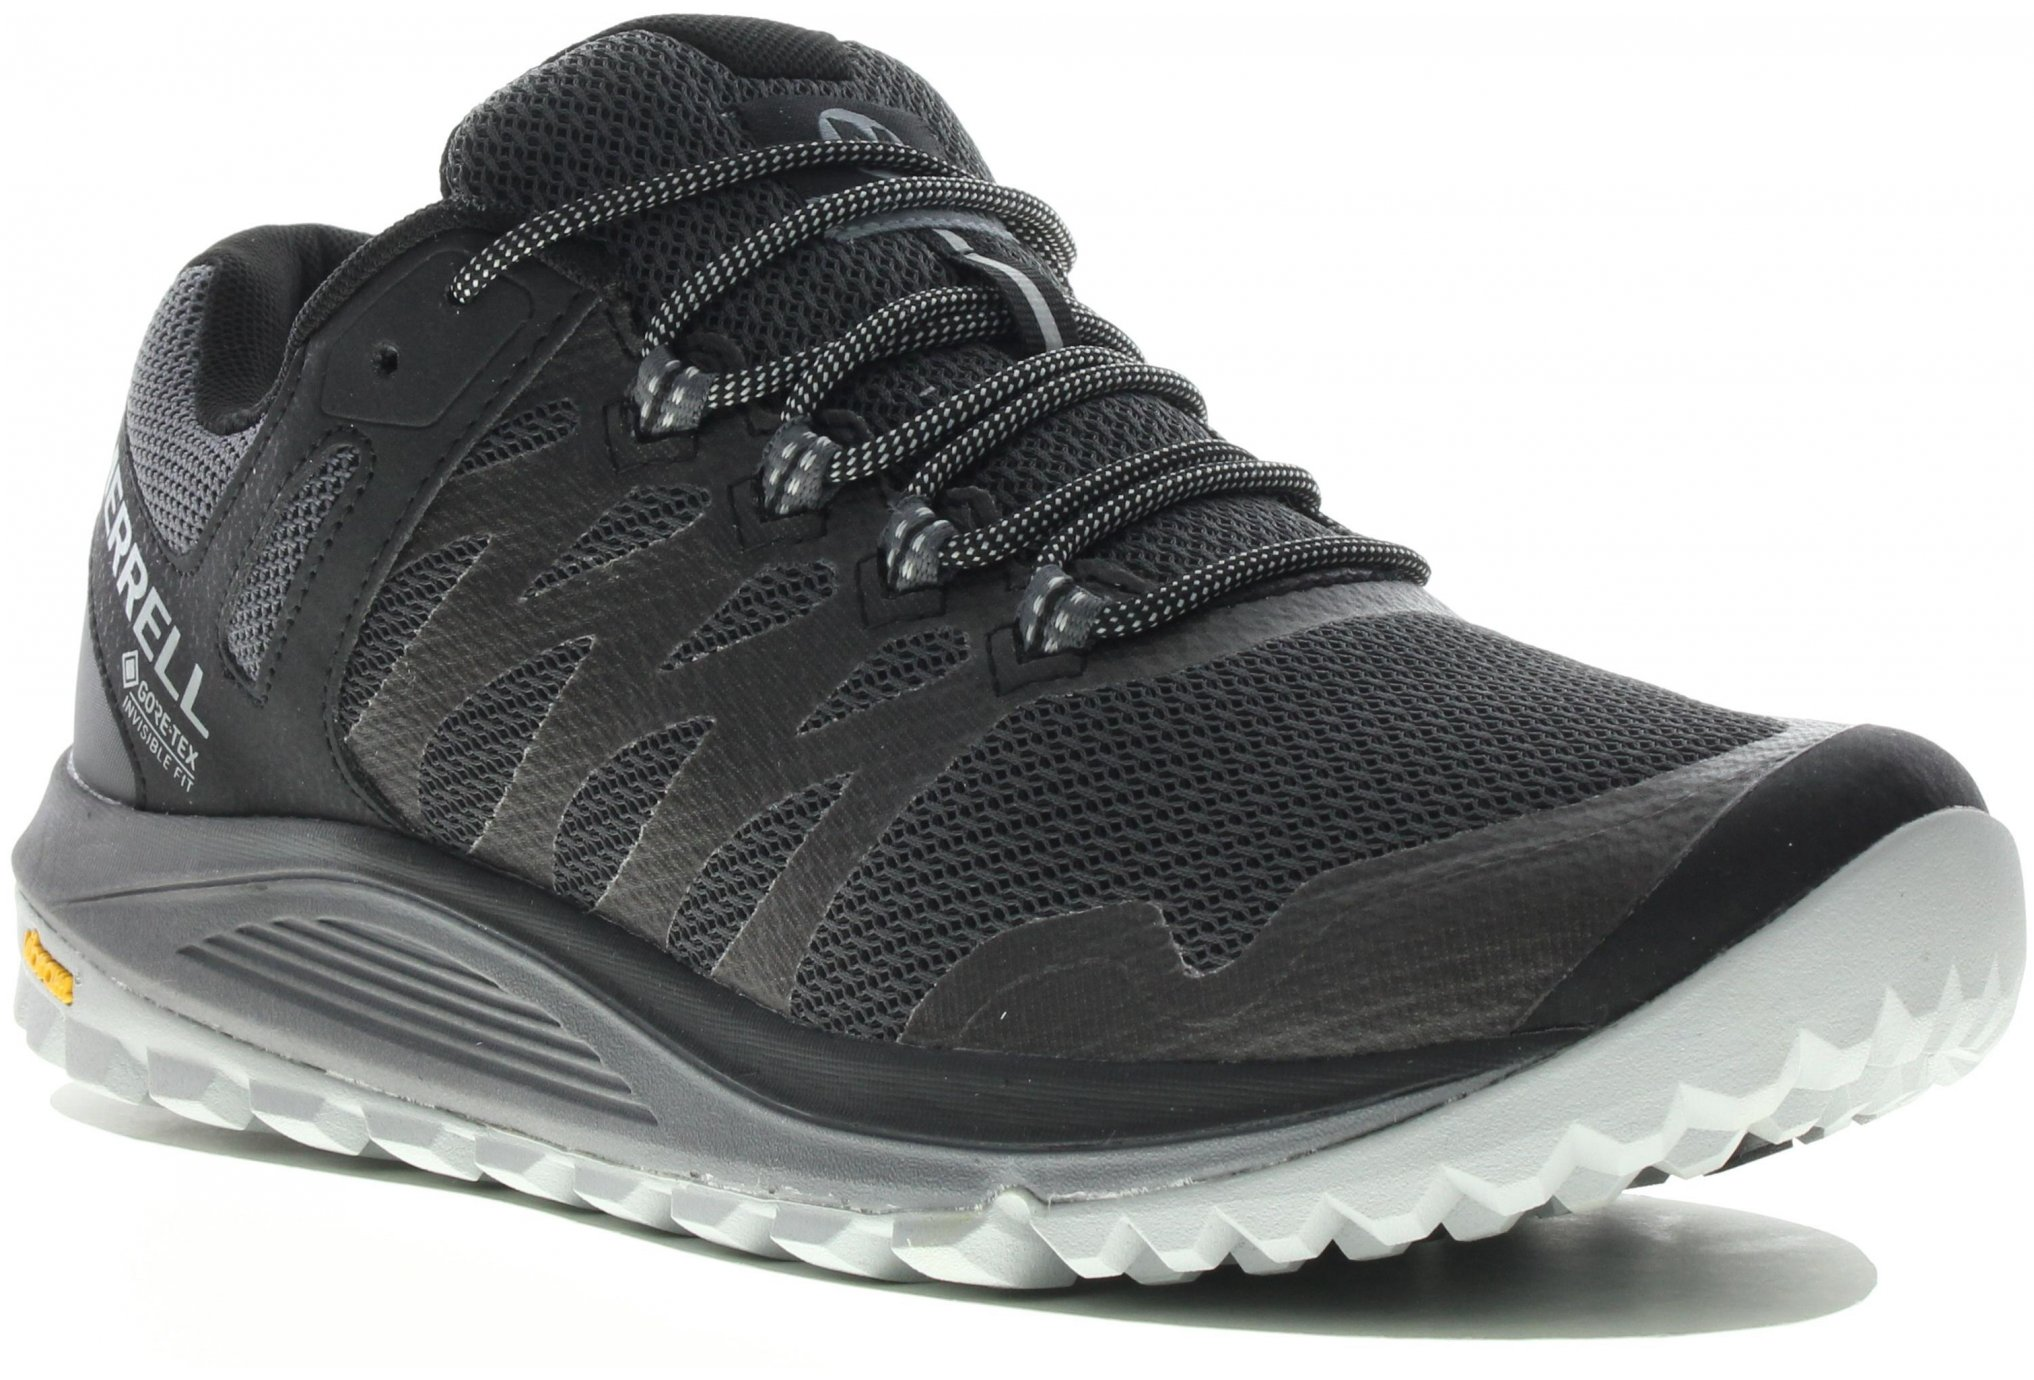 Merrell Nova 2 Gore-Tex M Chaussures homme